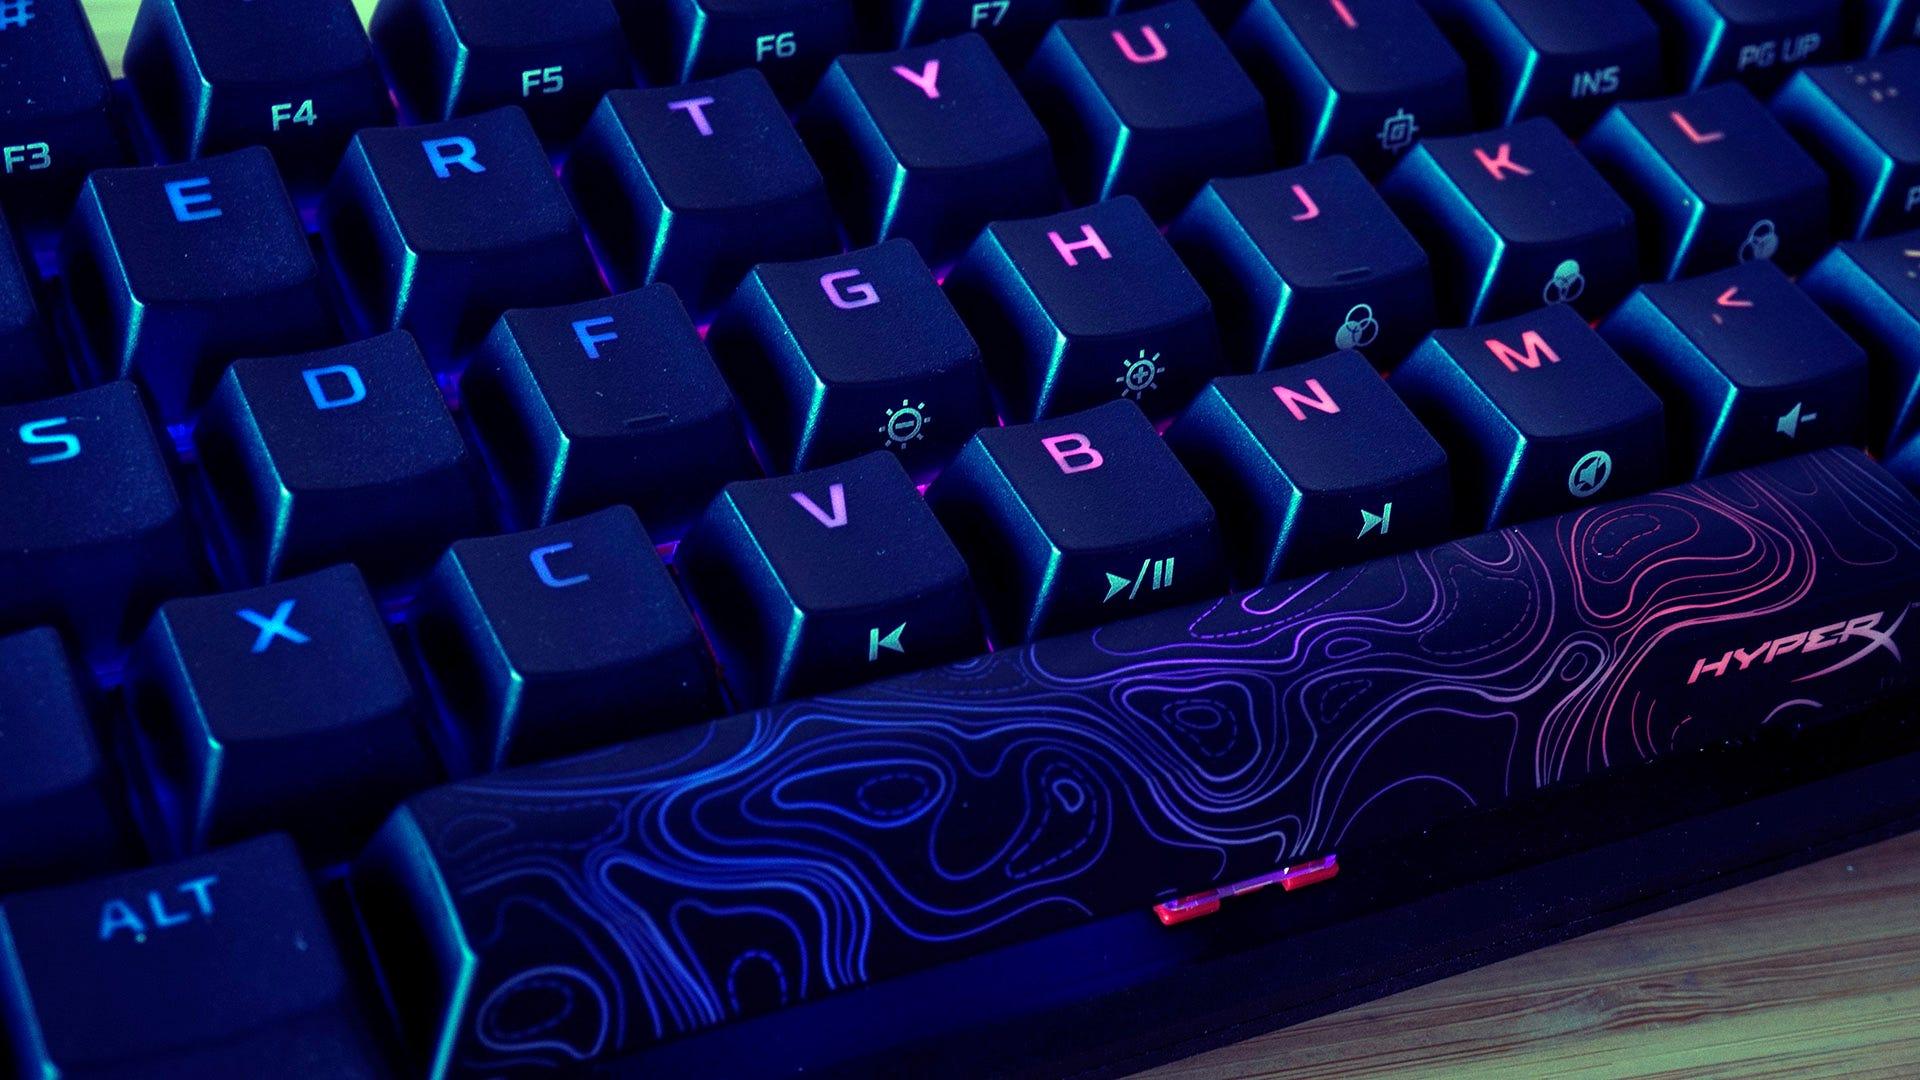 HyperX Alloy Origins 60 space bar